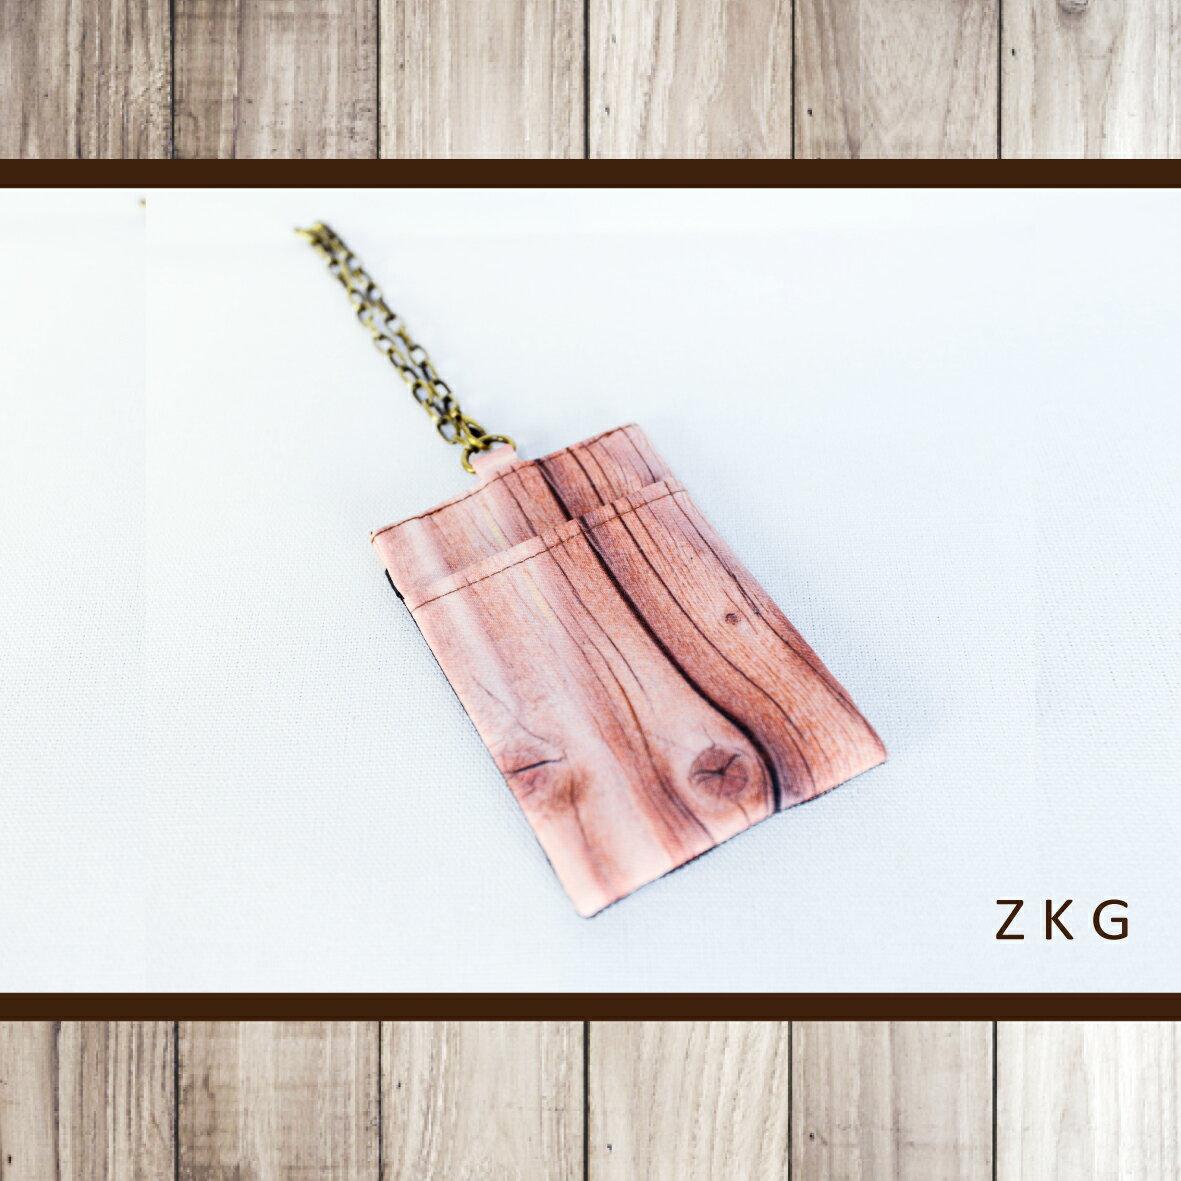 <br/><br/> ZKG 木系列-網布卡套-單個入 台灣(手工製)*送禮*自用*<br/><br/>